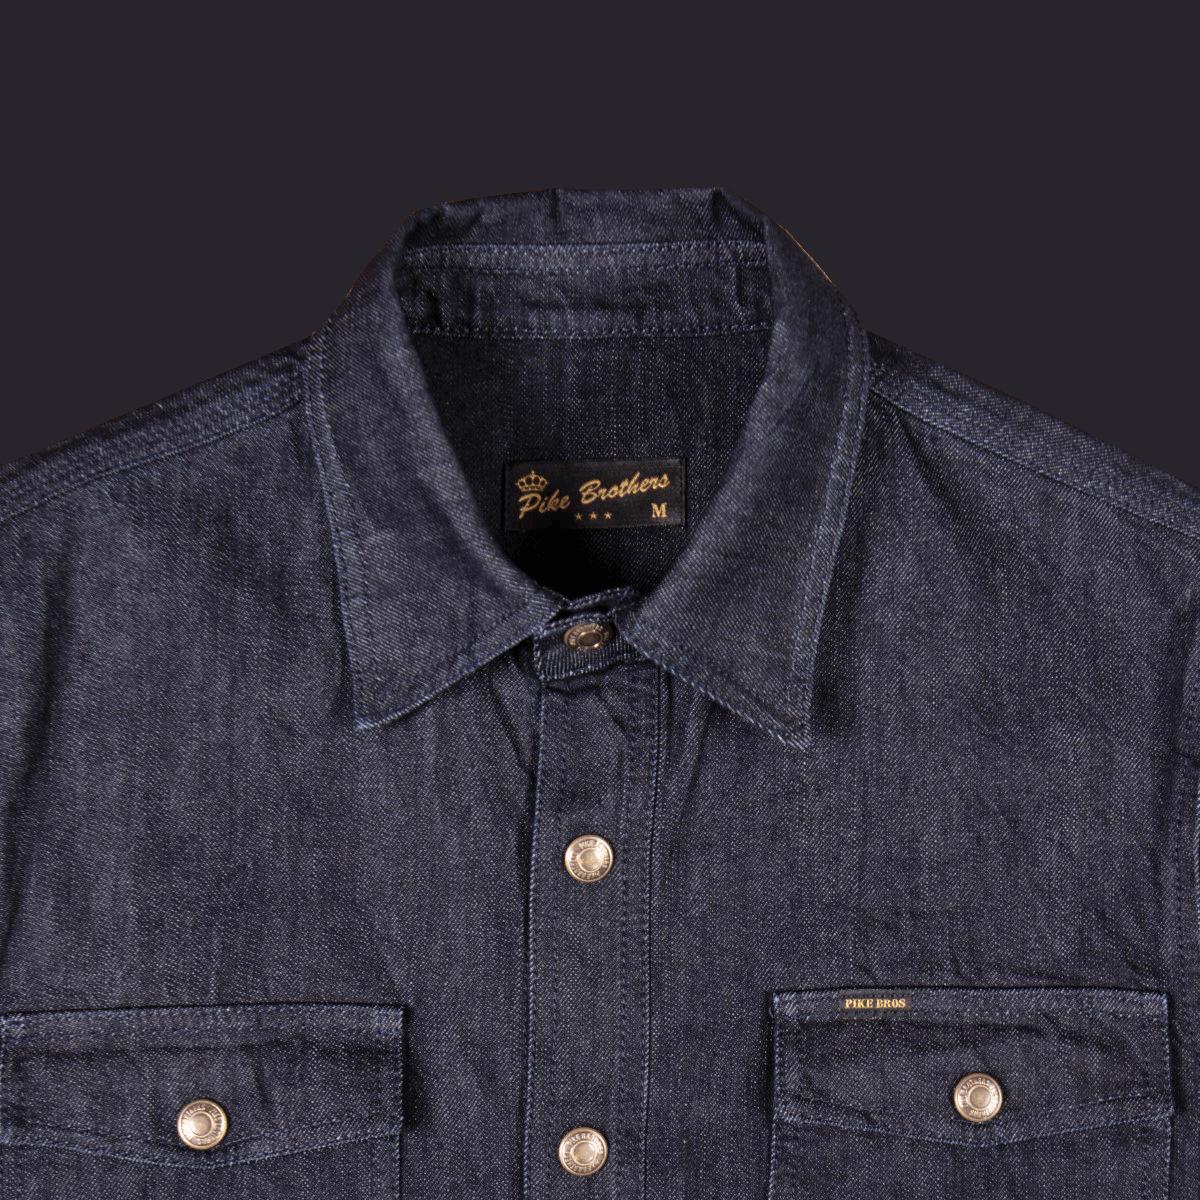 Pike Brothers 1943 CPO Shirt - indigo